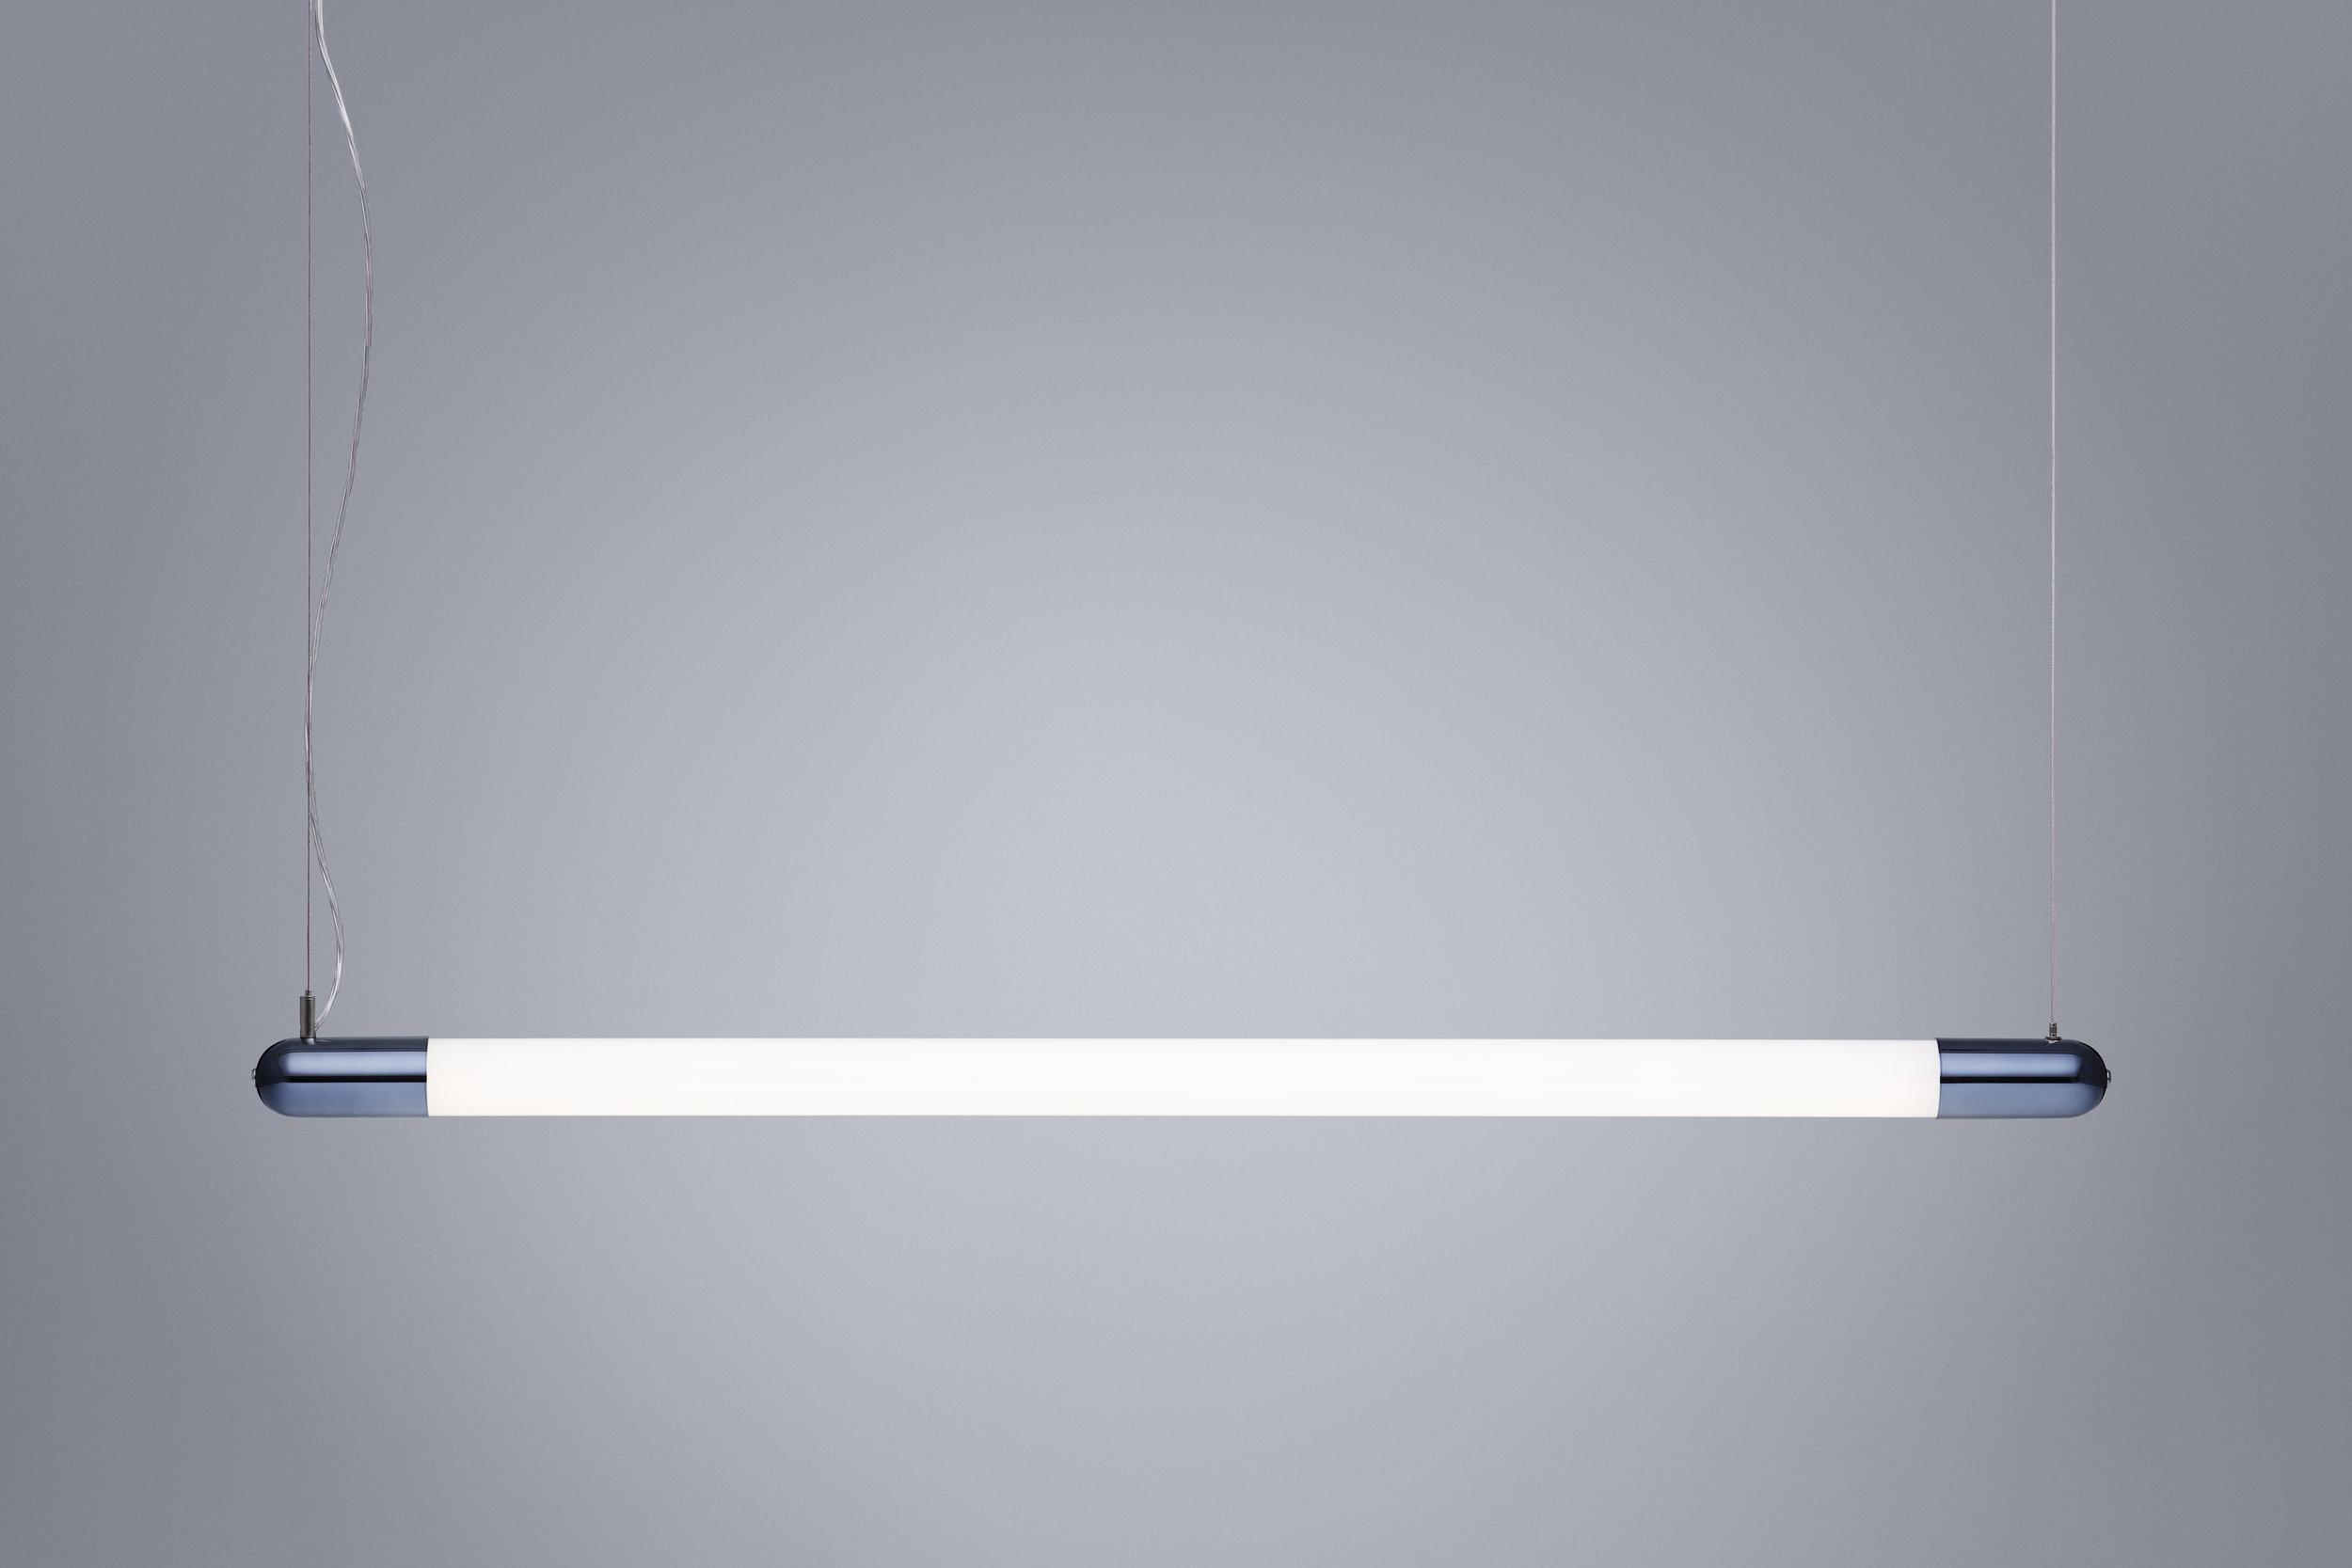 ISM Objects_Snag horizontal long bright black chrome_Pendant.jpg